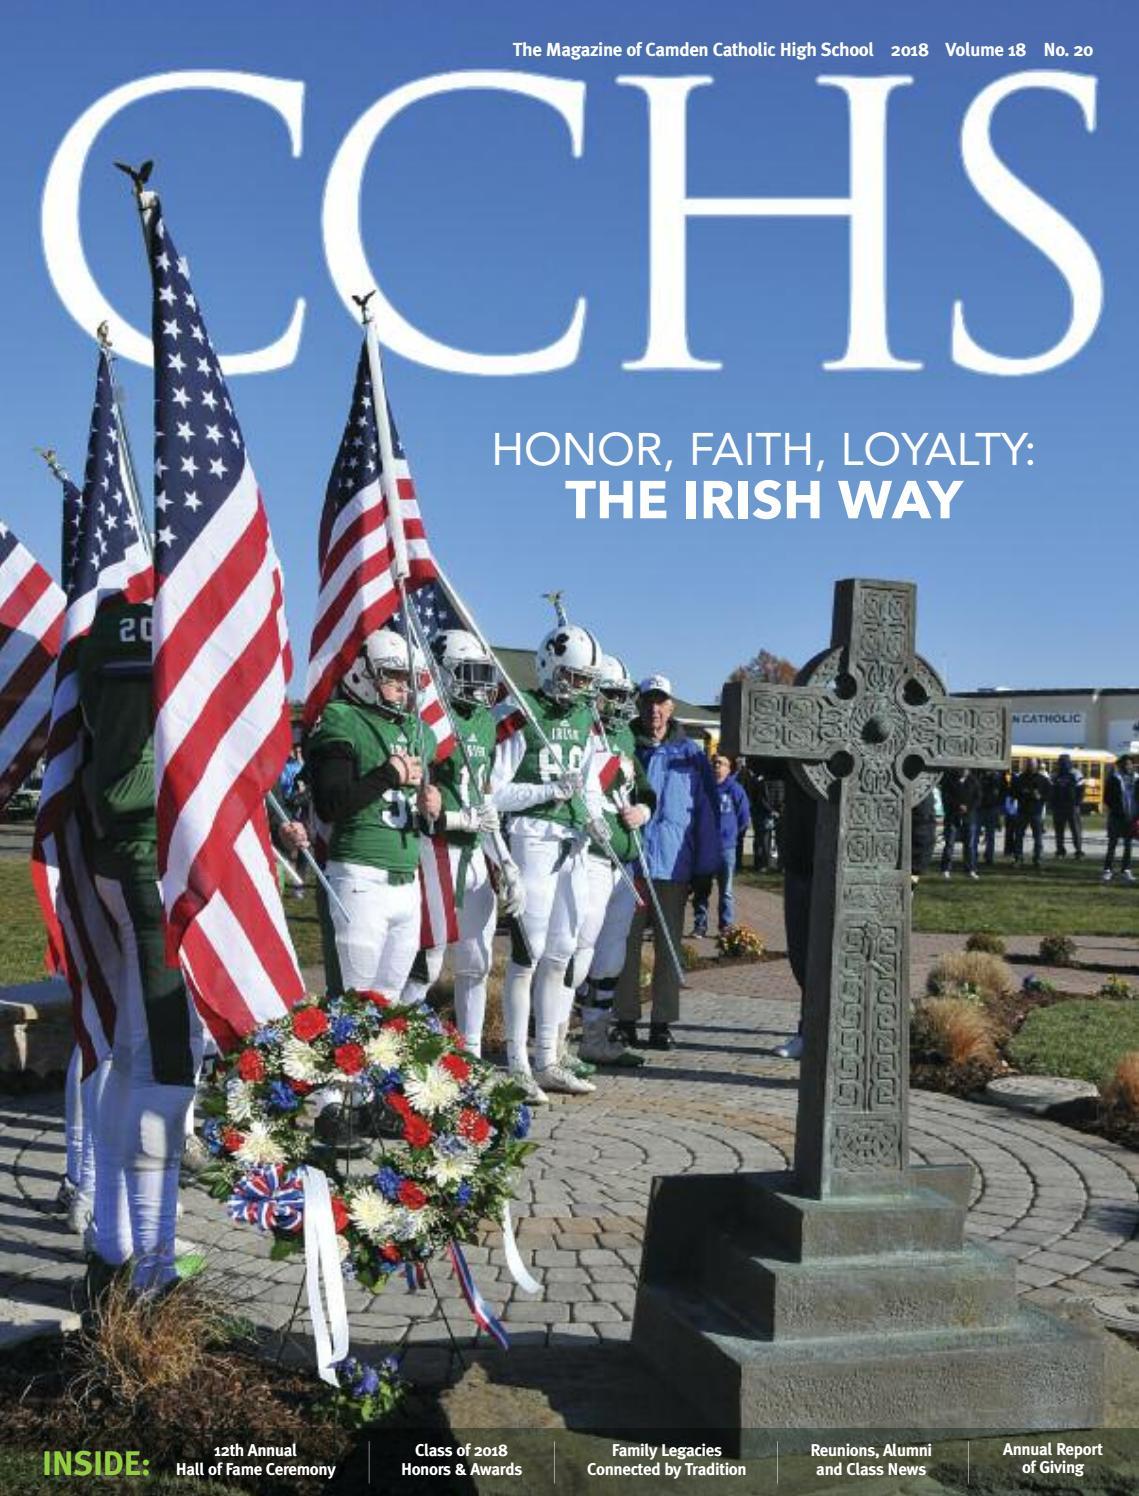 A Surprising Family Legacy Molecular >> Cchs Magazine 2018 By Camden Catholic High School Issuu